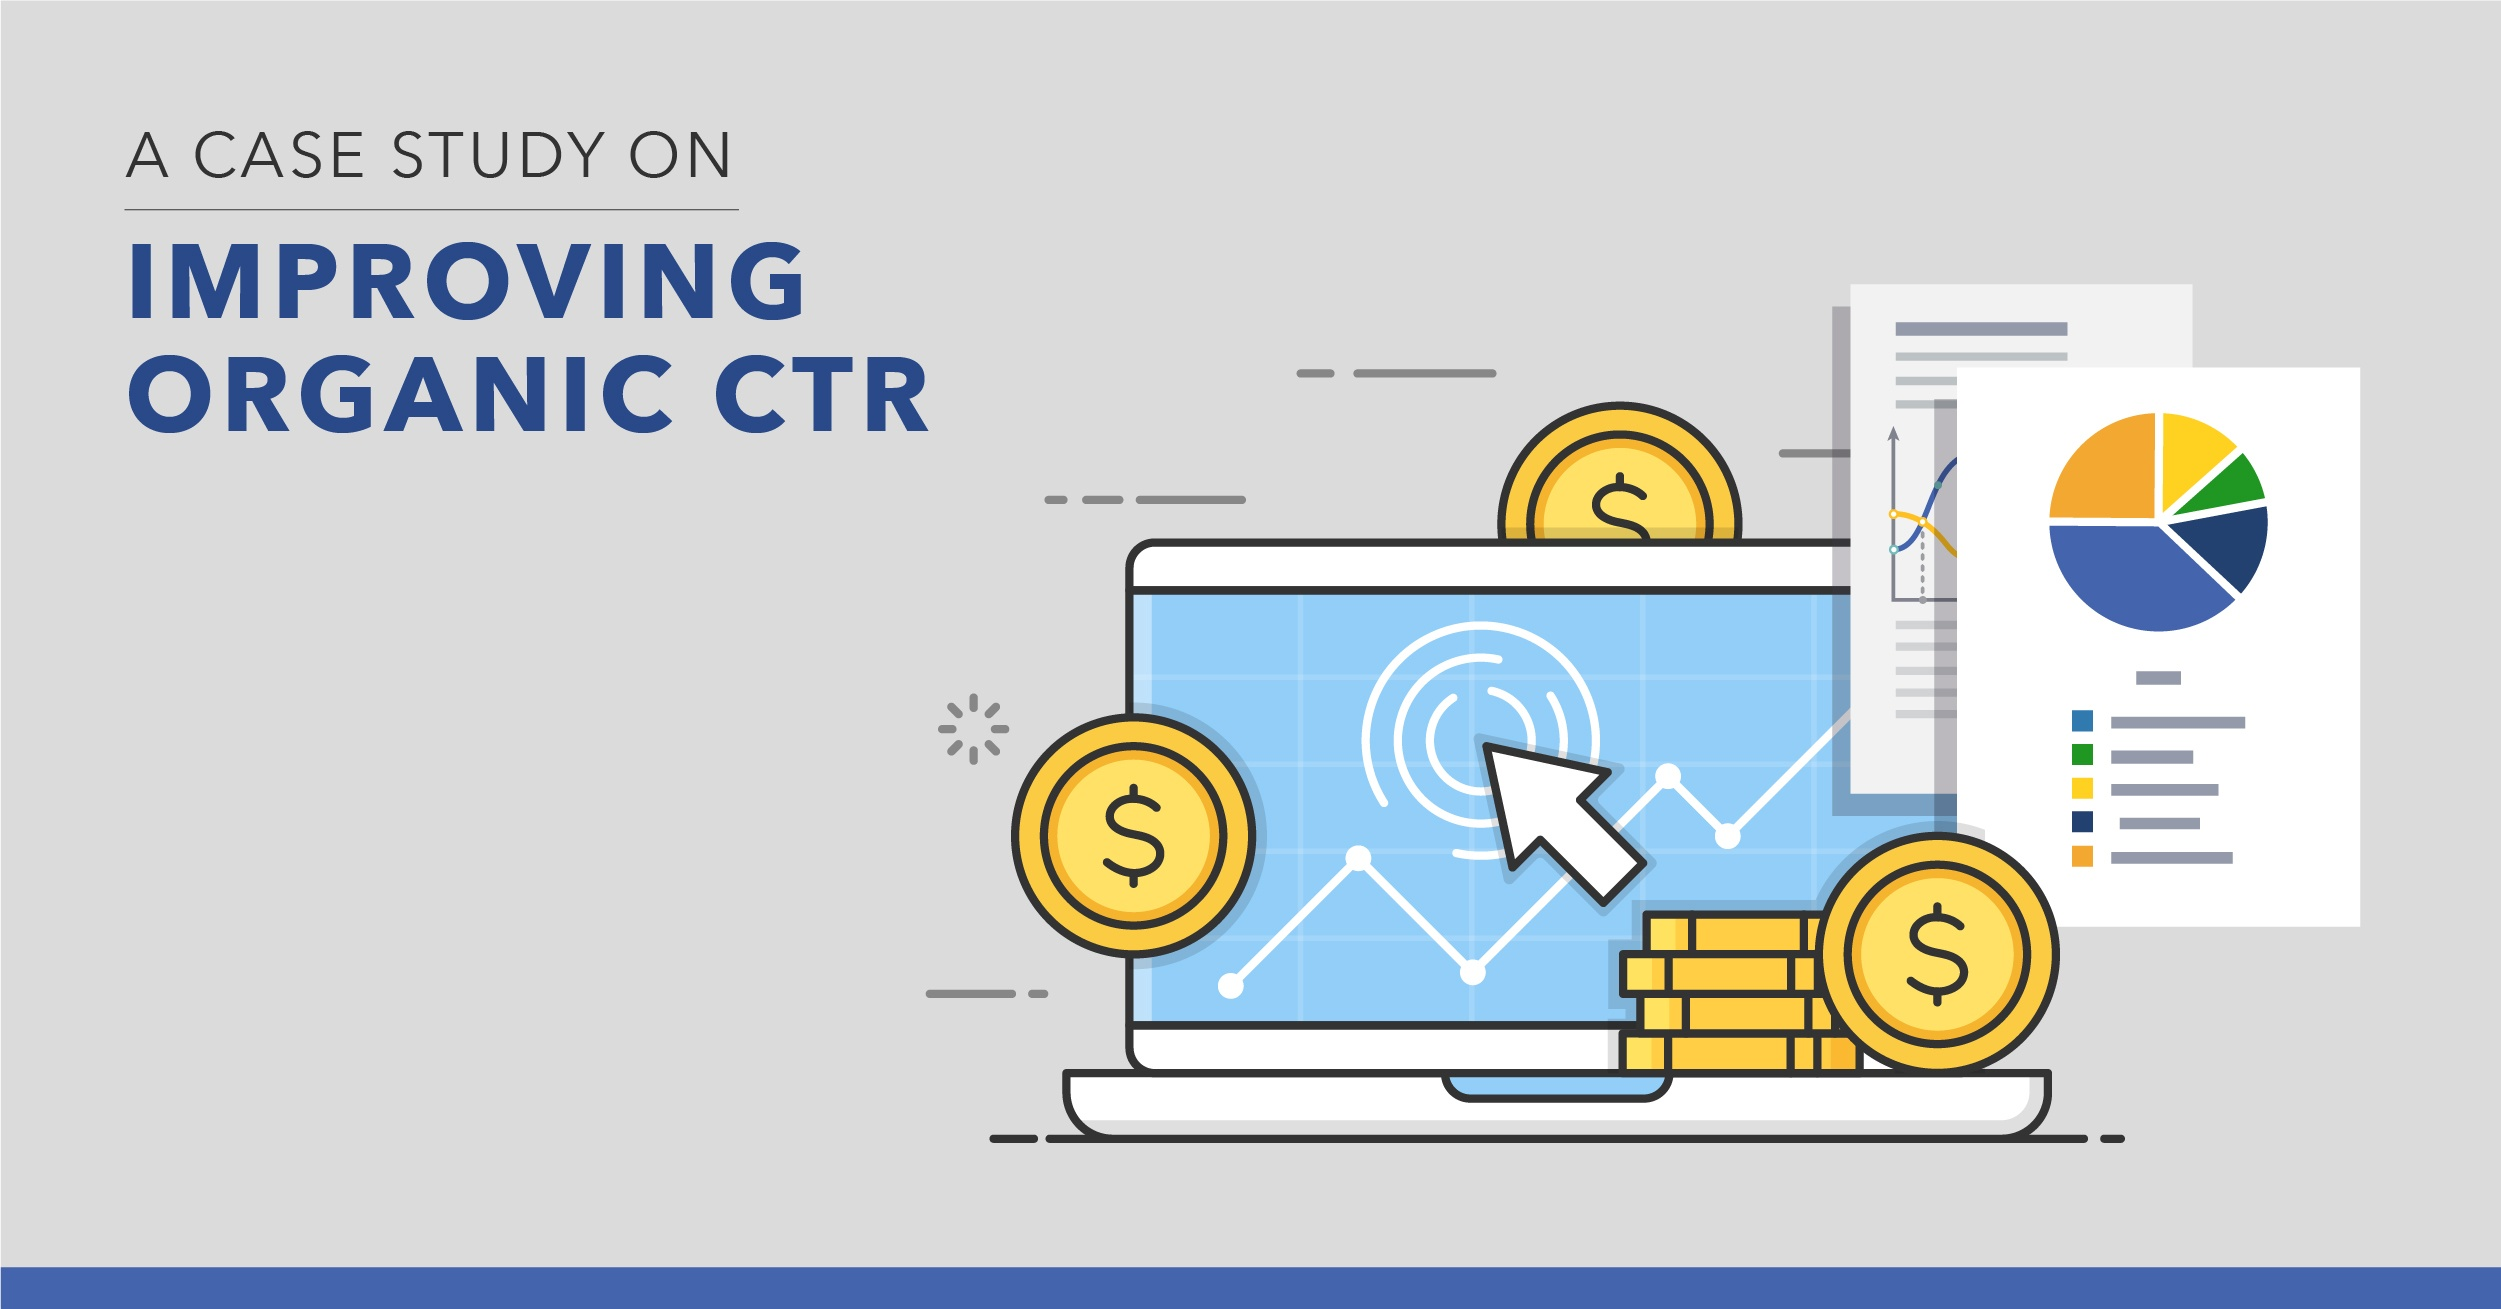 Strategies to Improve Organic CTR